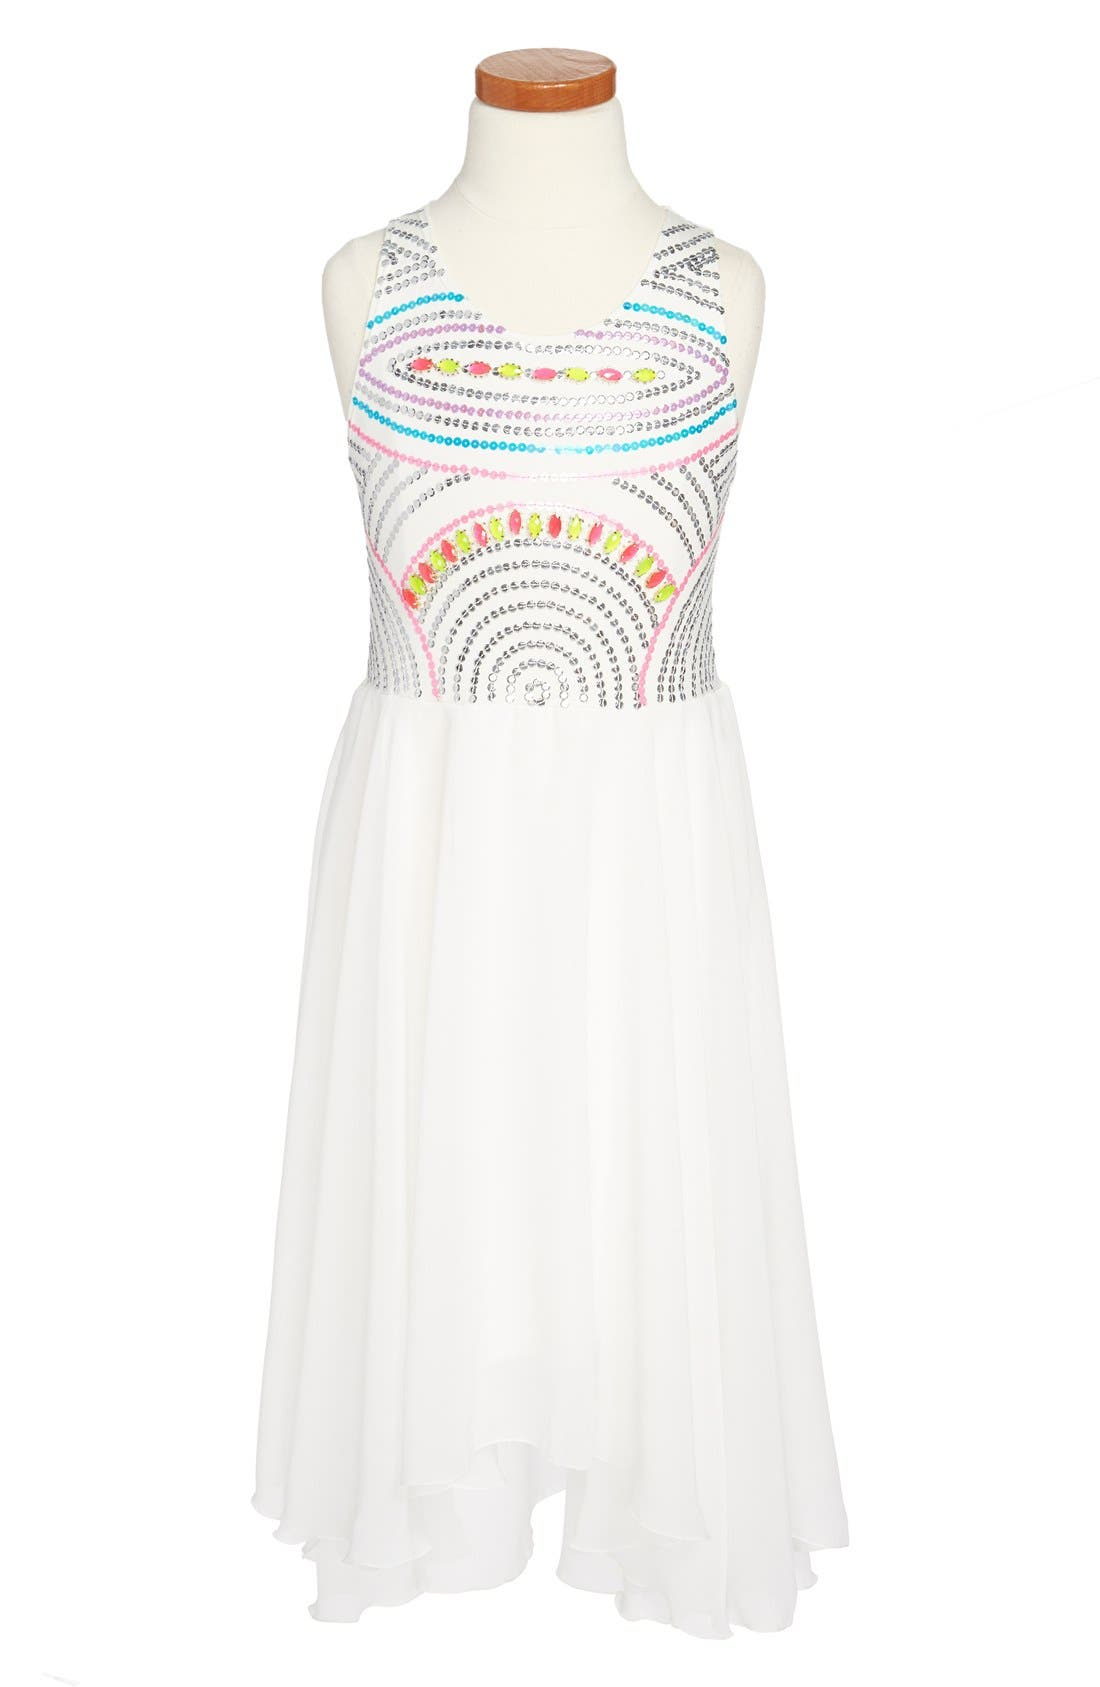 Alternate Image 1 Selected - Flowers by Zoe Chiffon Dress (Big Girls)